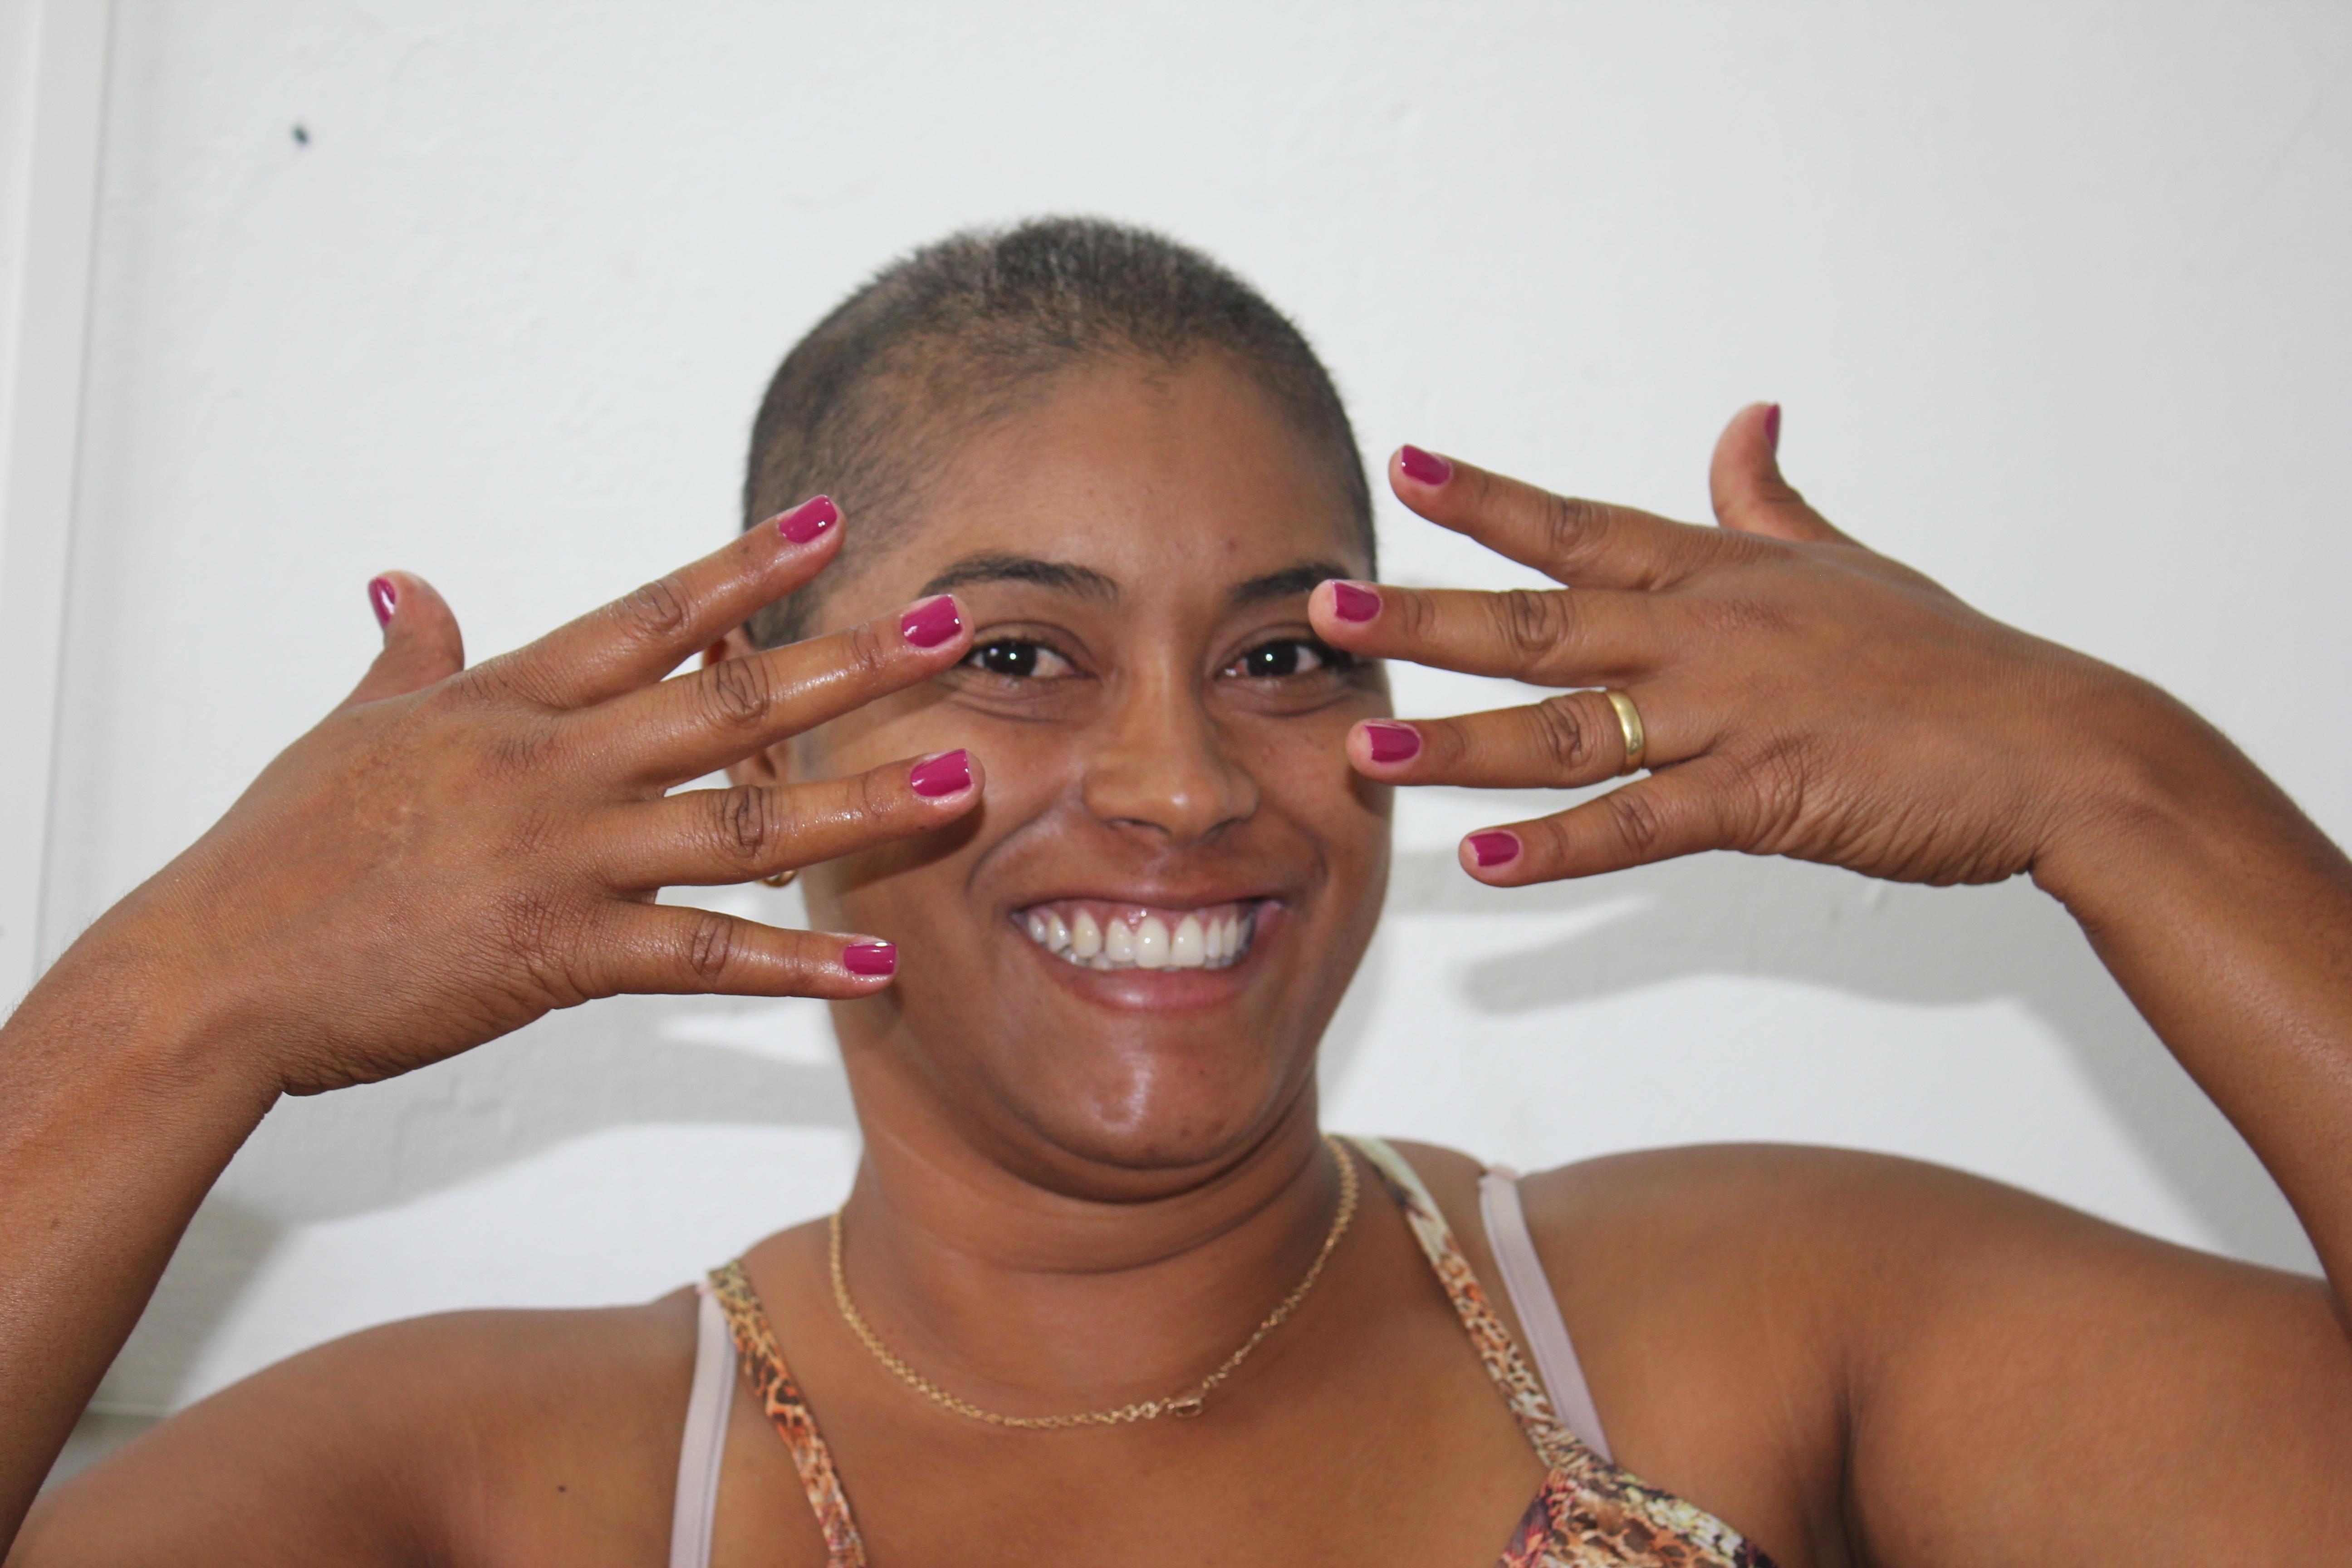 belas unhas com belo sorriso, cliente satisfeita....... unha designer de sobrancelhas maquiador(a) cabeleireiro(a) manicure e pedicure